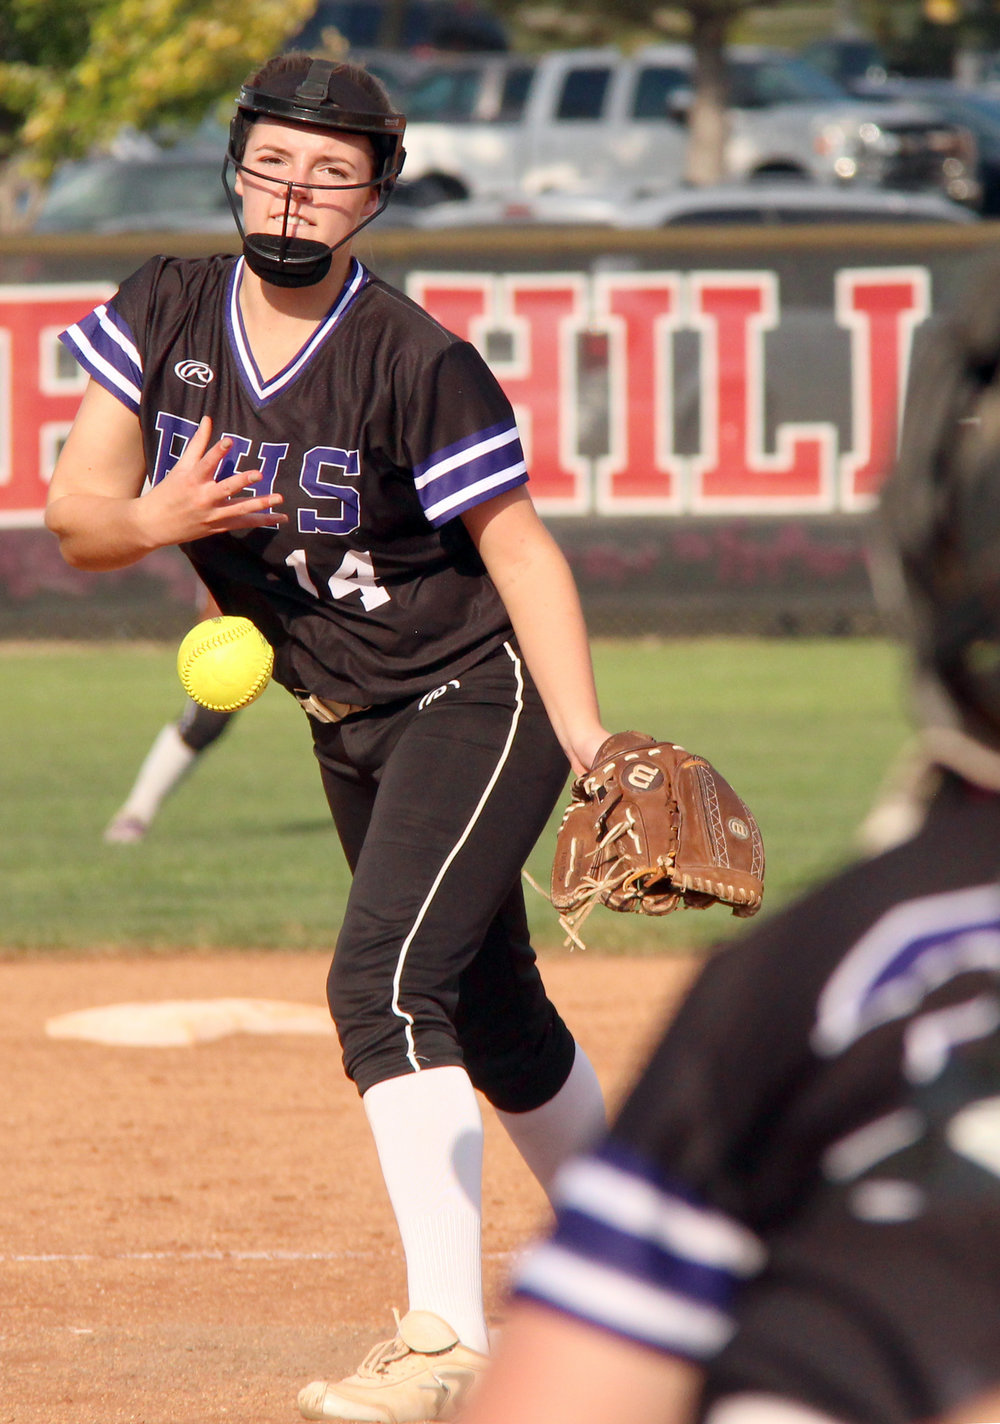 ROSS MARTIN/Citizen photo Park Hill South junior Gracie Dieleman, right, delivers a pitch to sophomore catcher Meggen Keller.